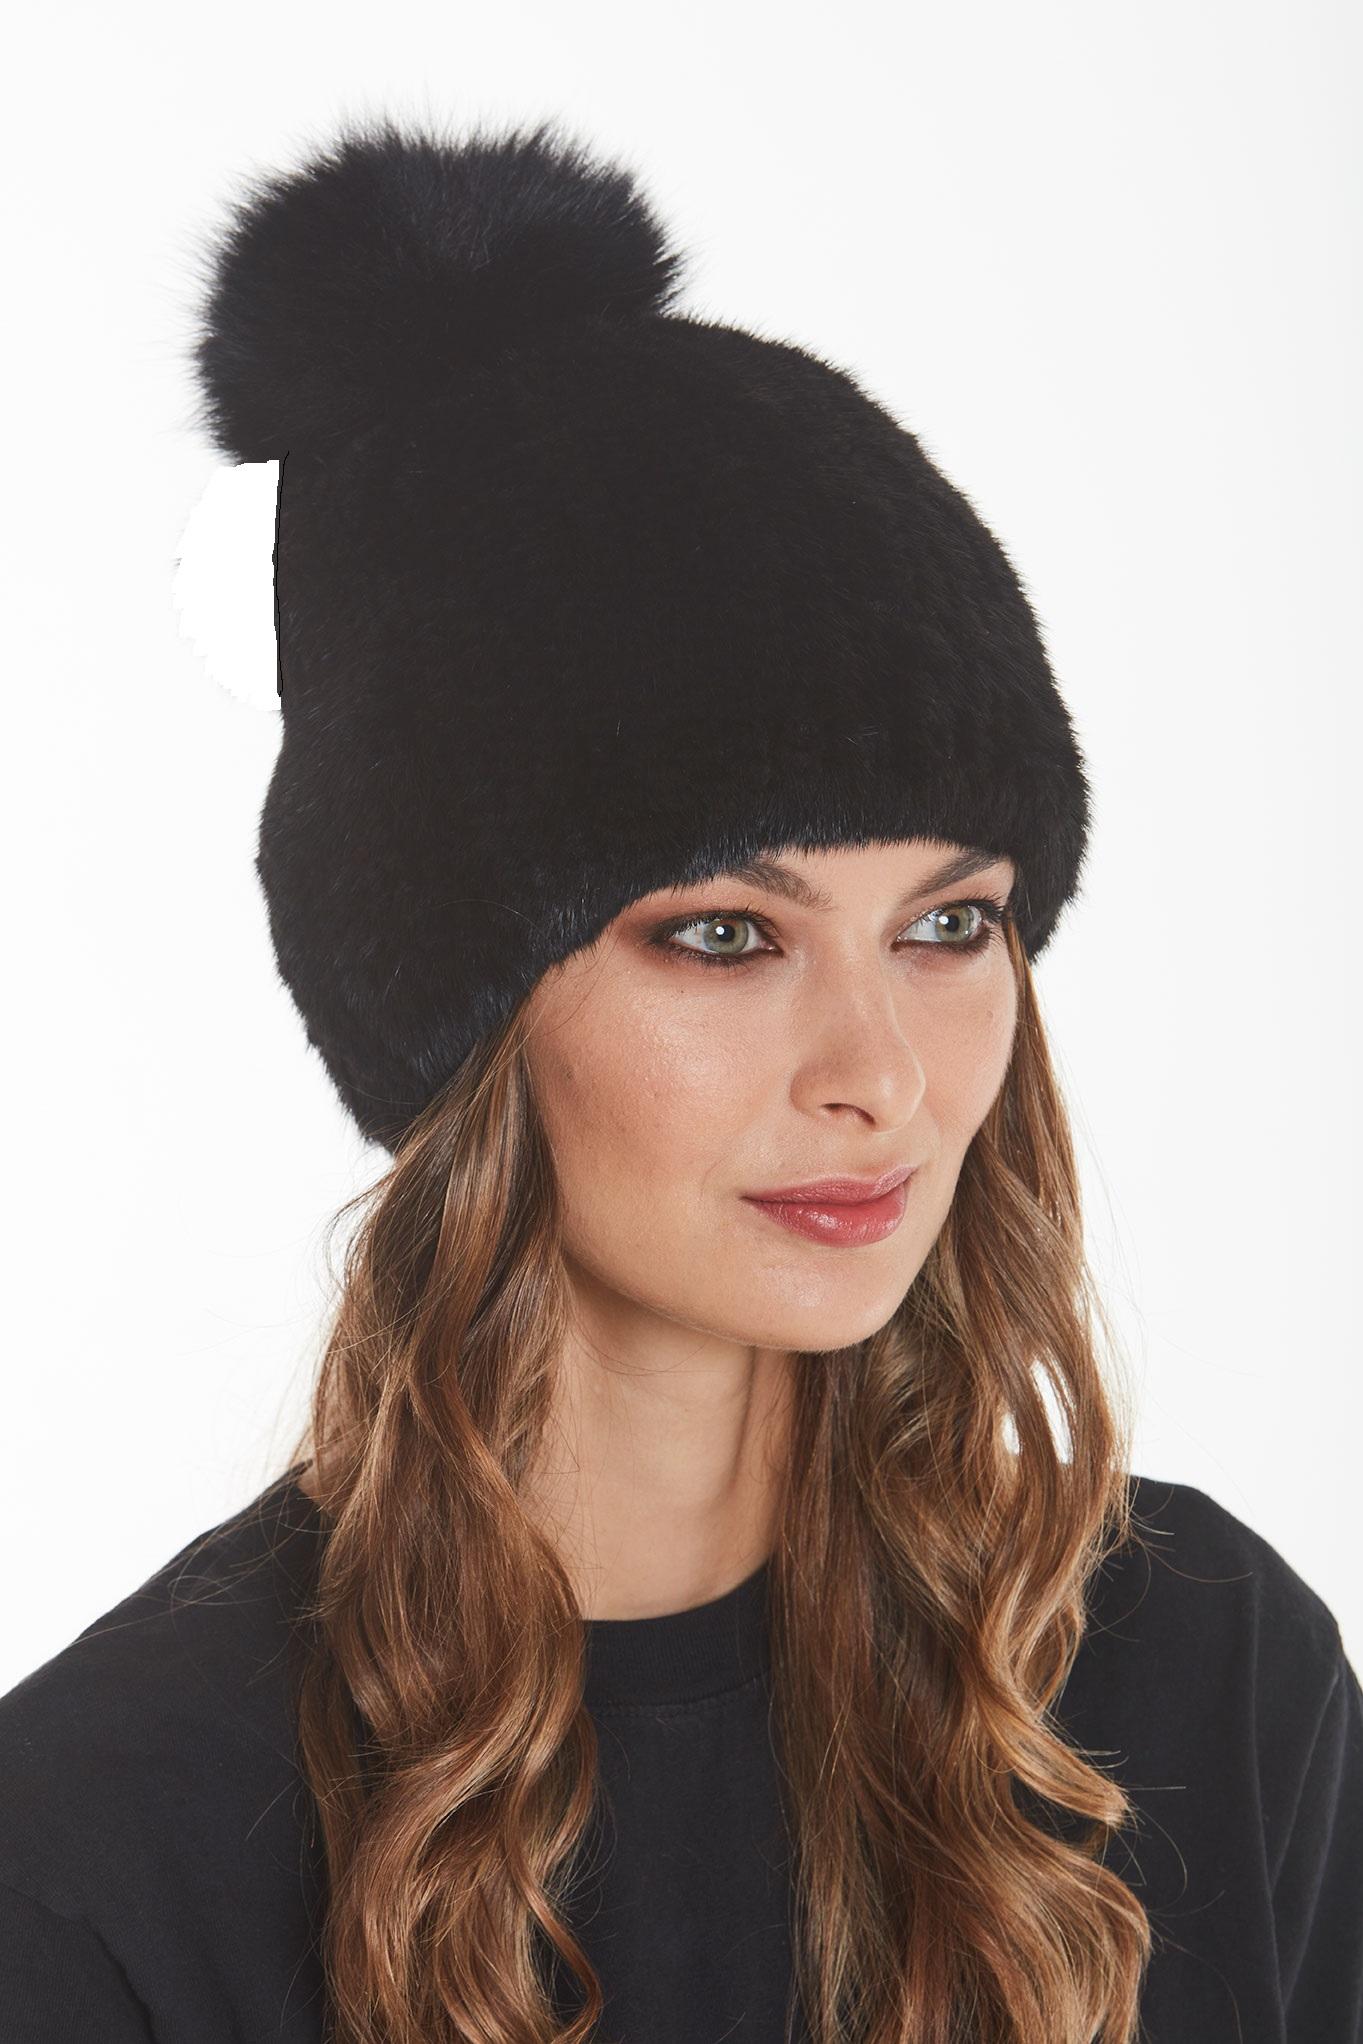 mink-black-hat-pom-pom